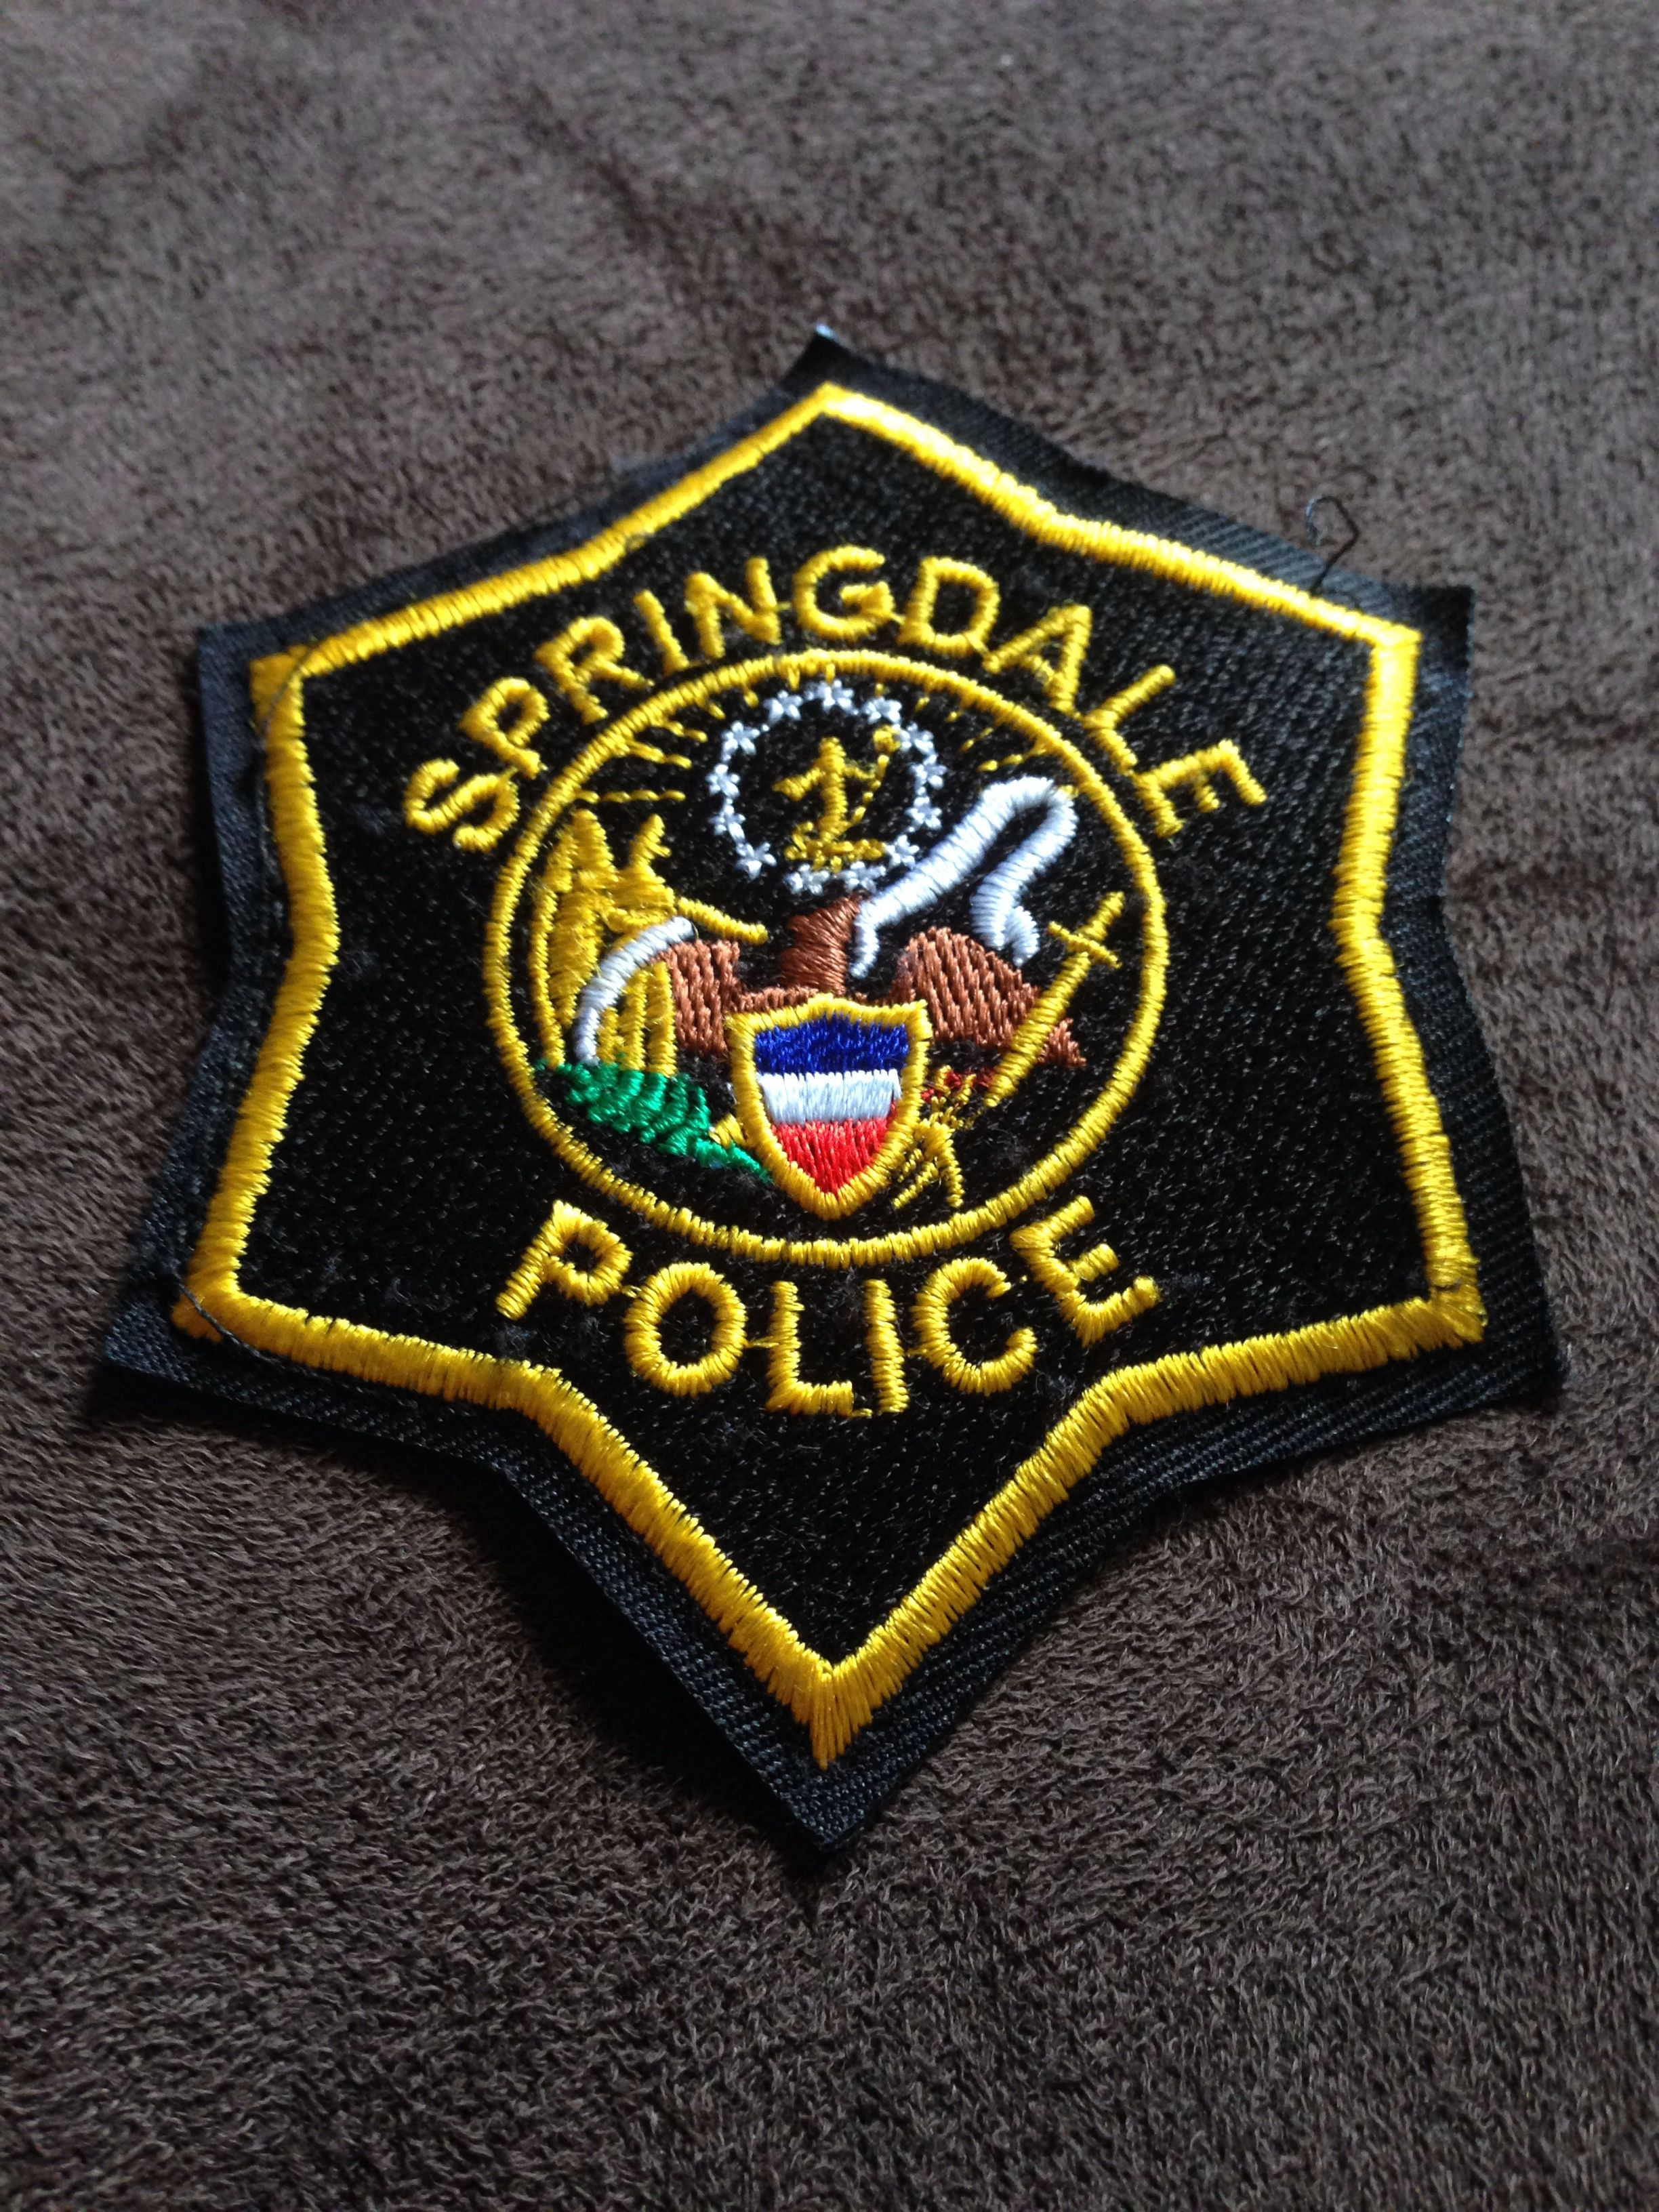 Springdale Police Department Current Police Badge Police Police Uniforms